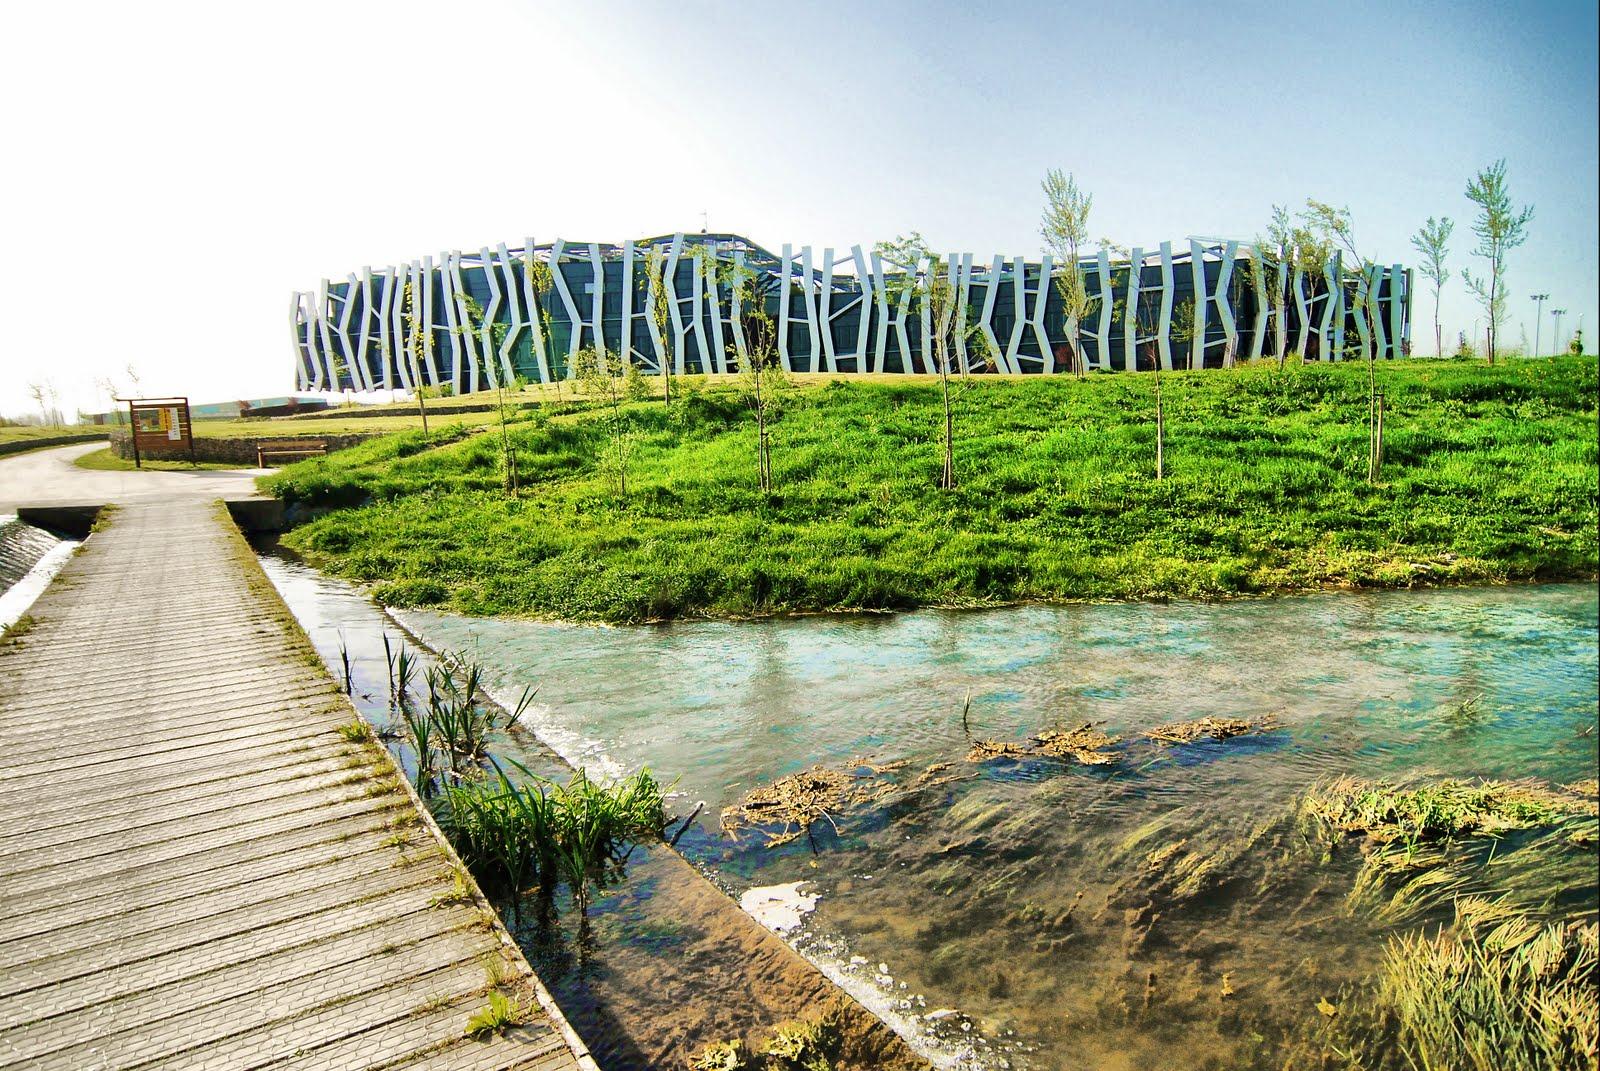 Nos vamos de paseo por el anillo verde de vitoria gasteiz - Arquitectura pais vasco ...